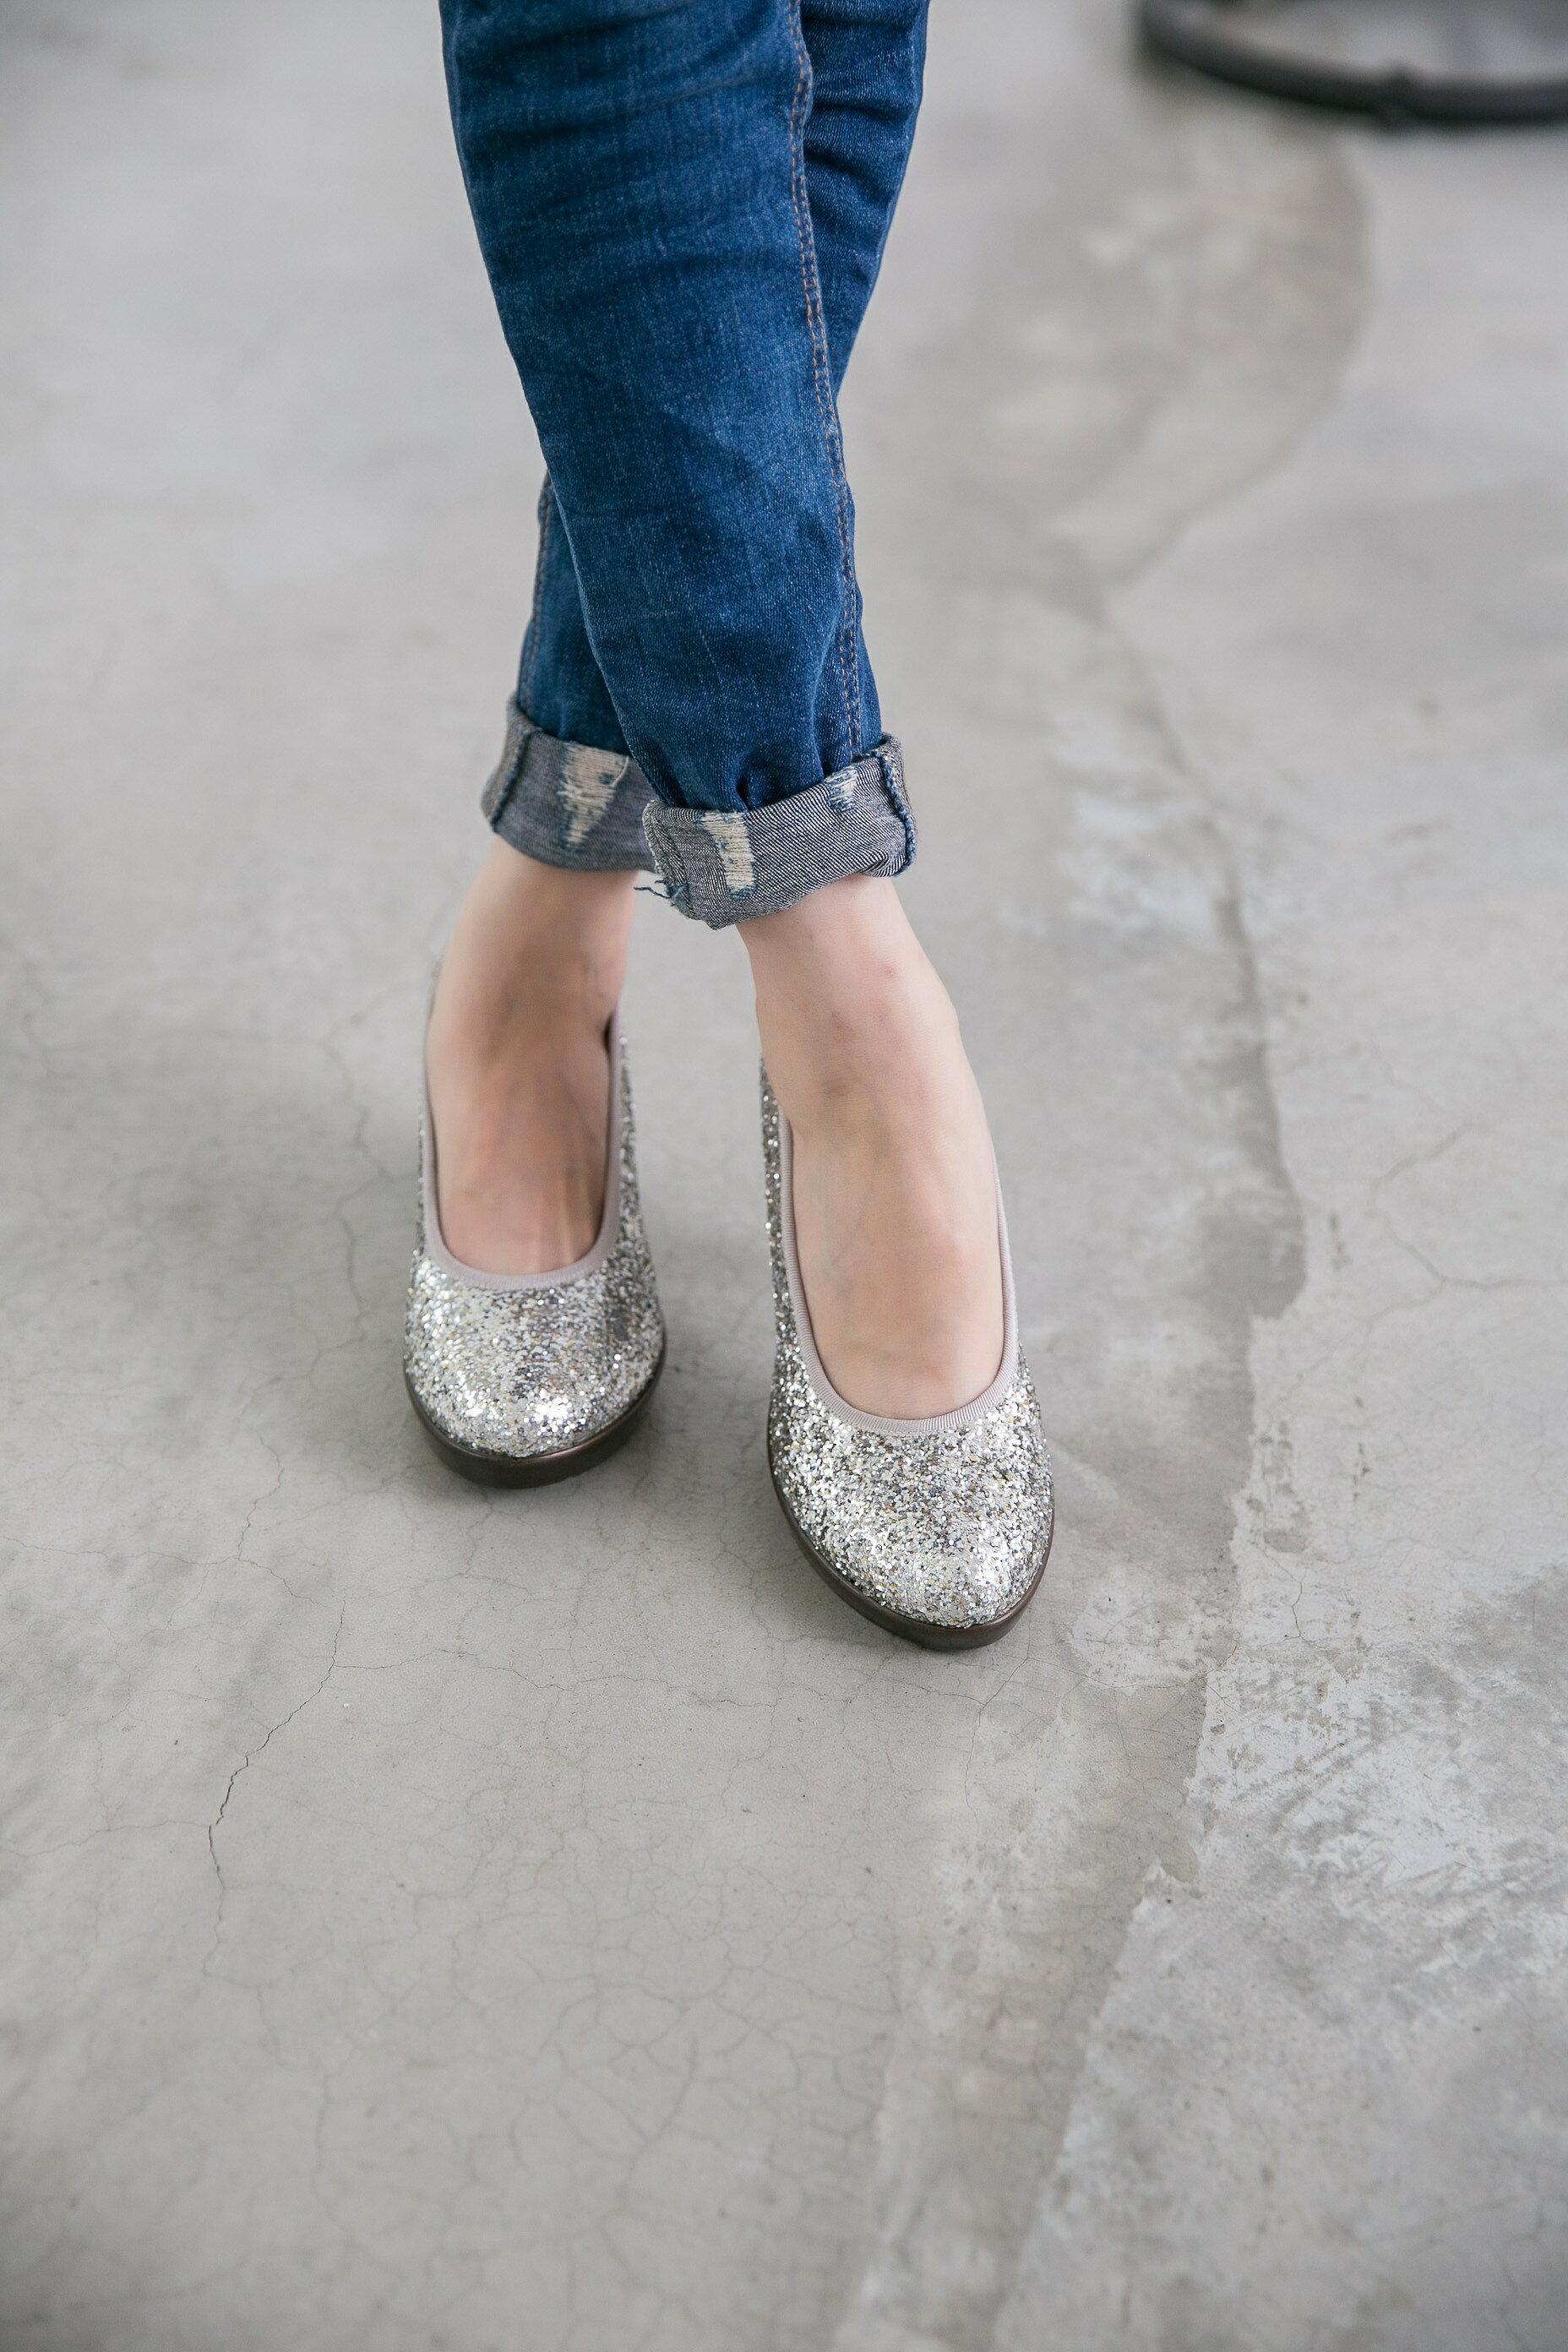 Aimez La Vie 舒適跟鞋 閃閃亮鑽約會Party厚底中跟鞋 2